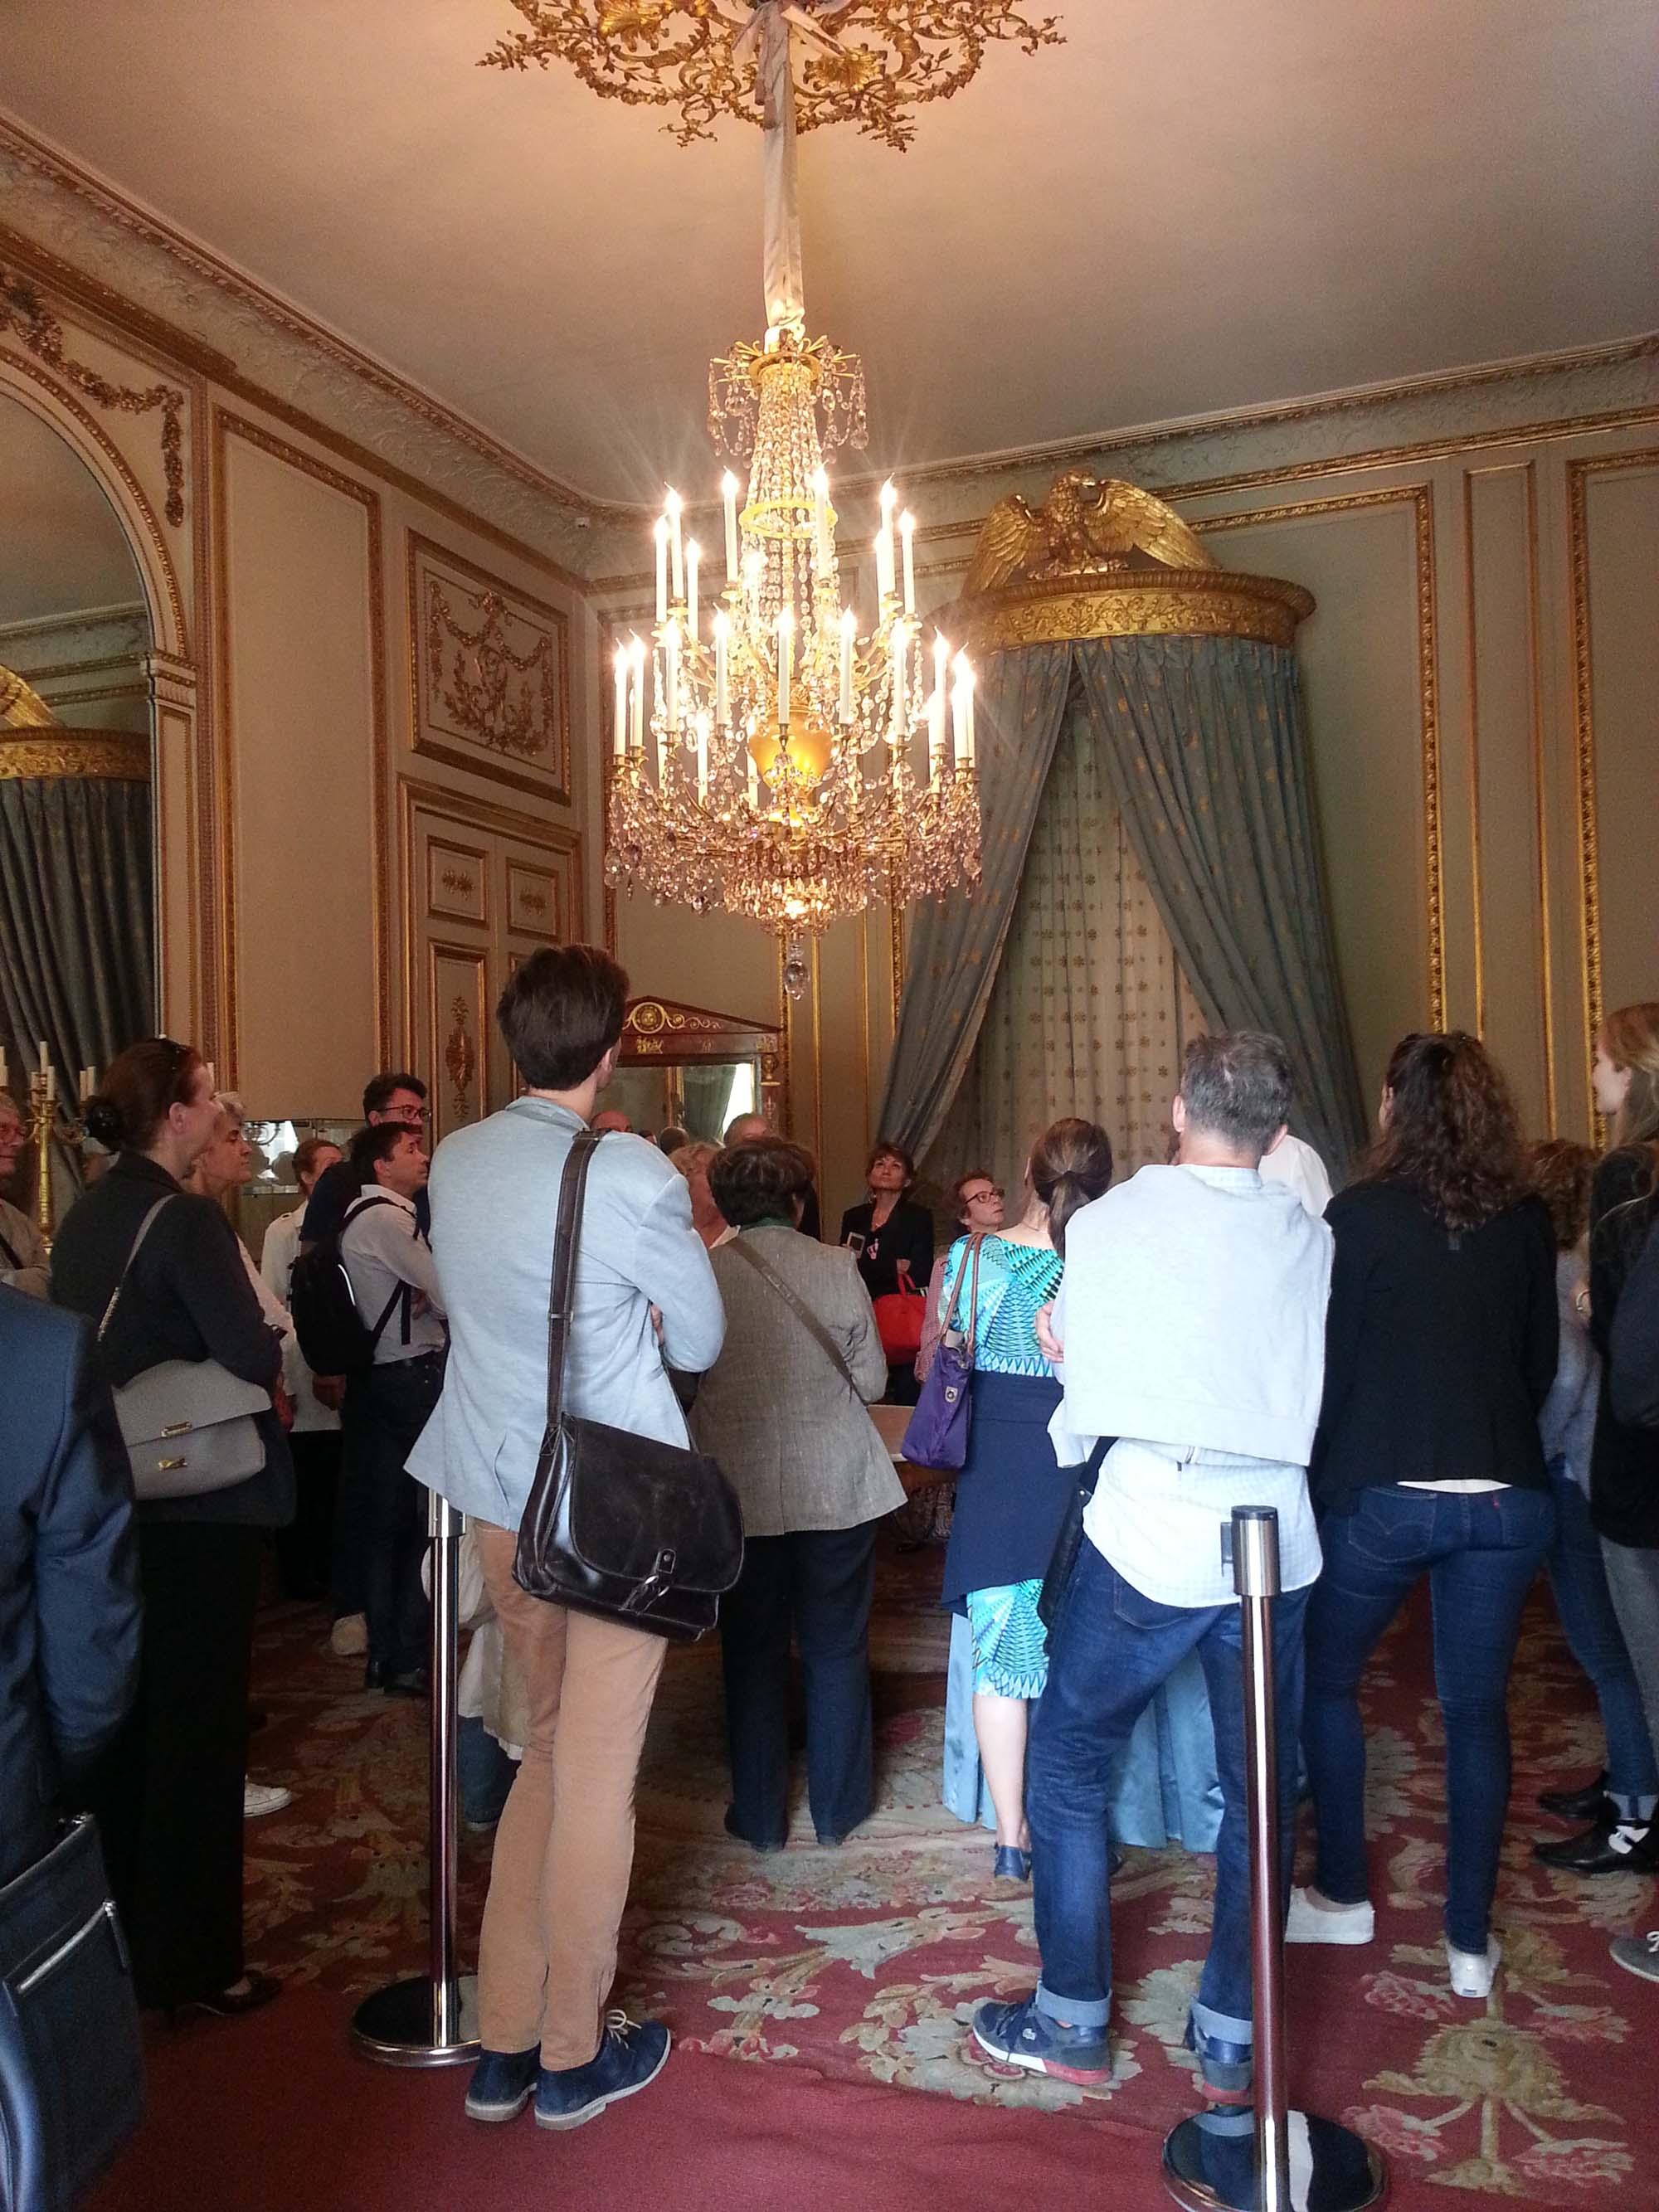 Galerie photos - Office tourisme grande bretagne paris ...